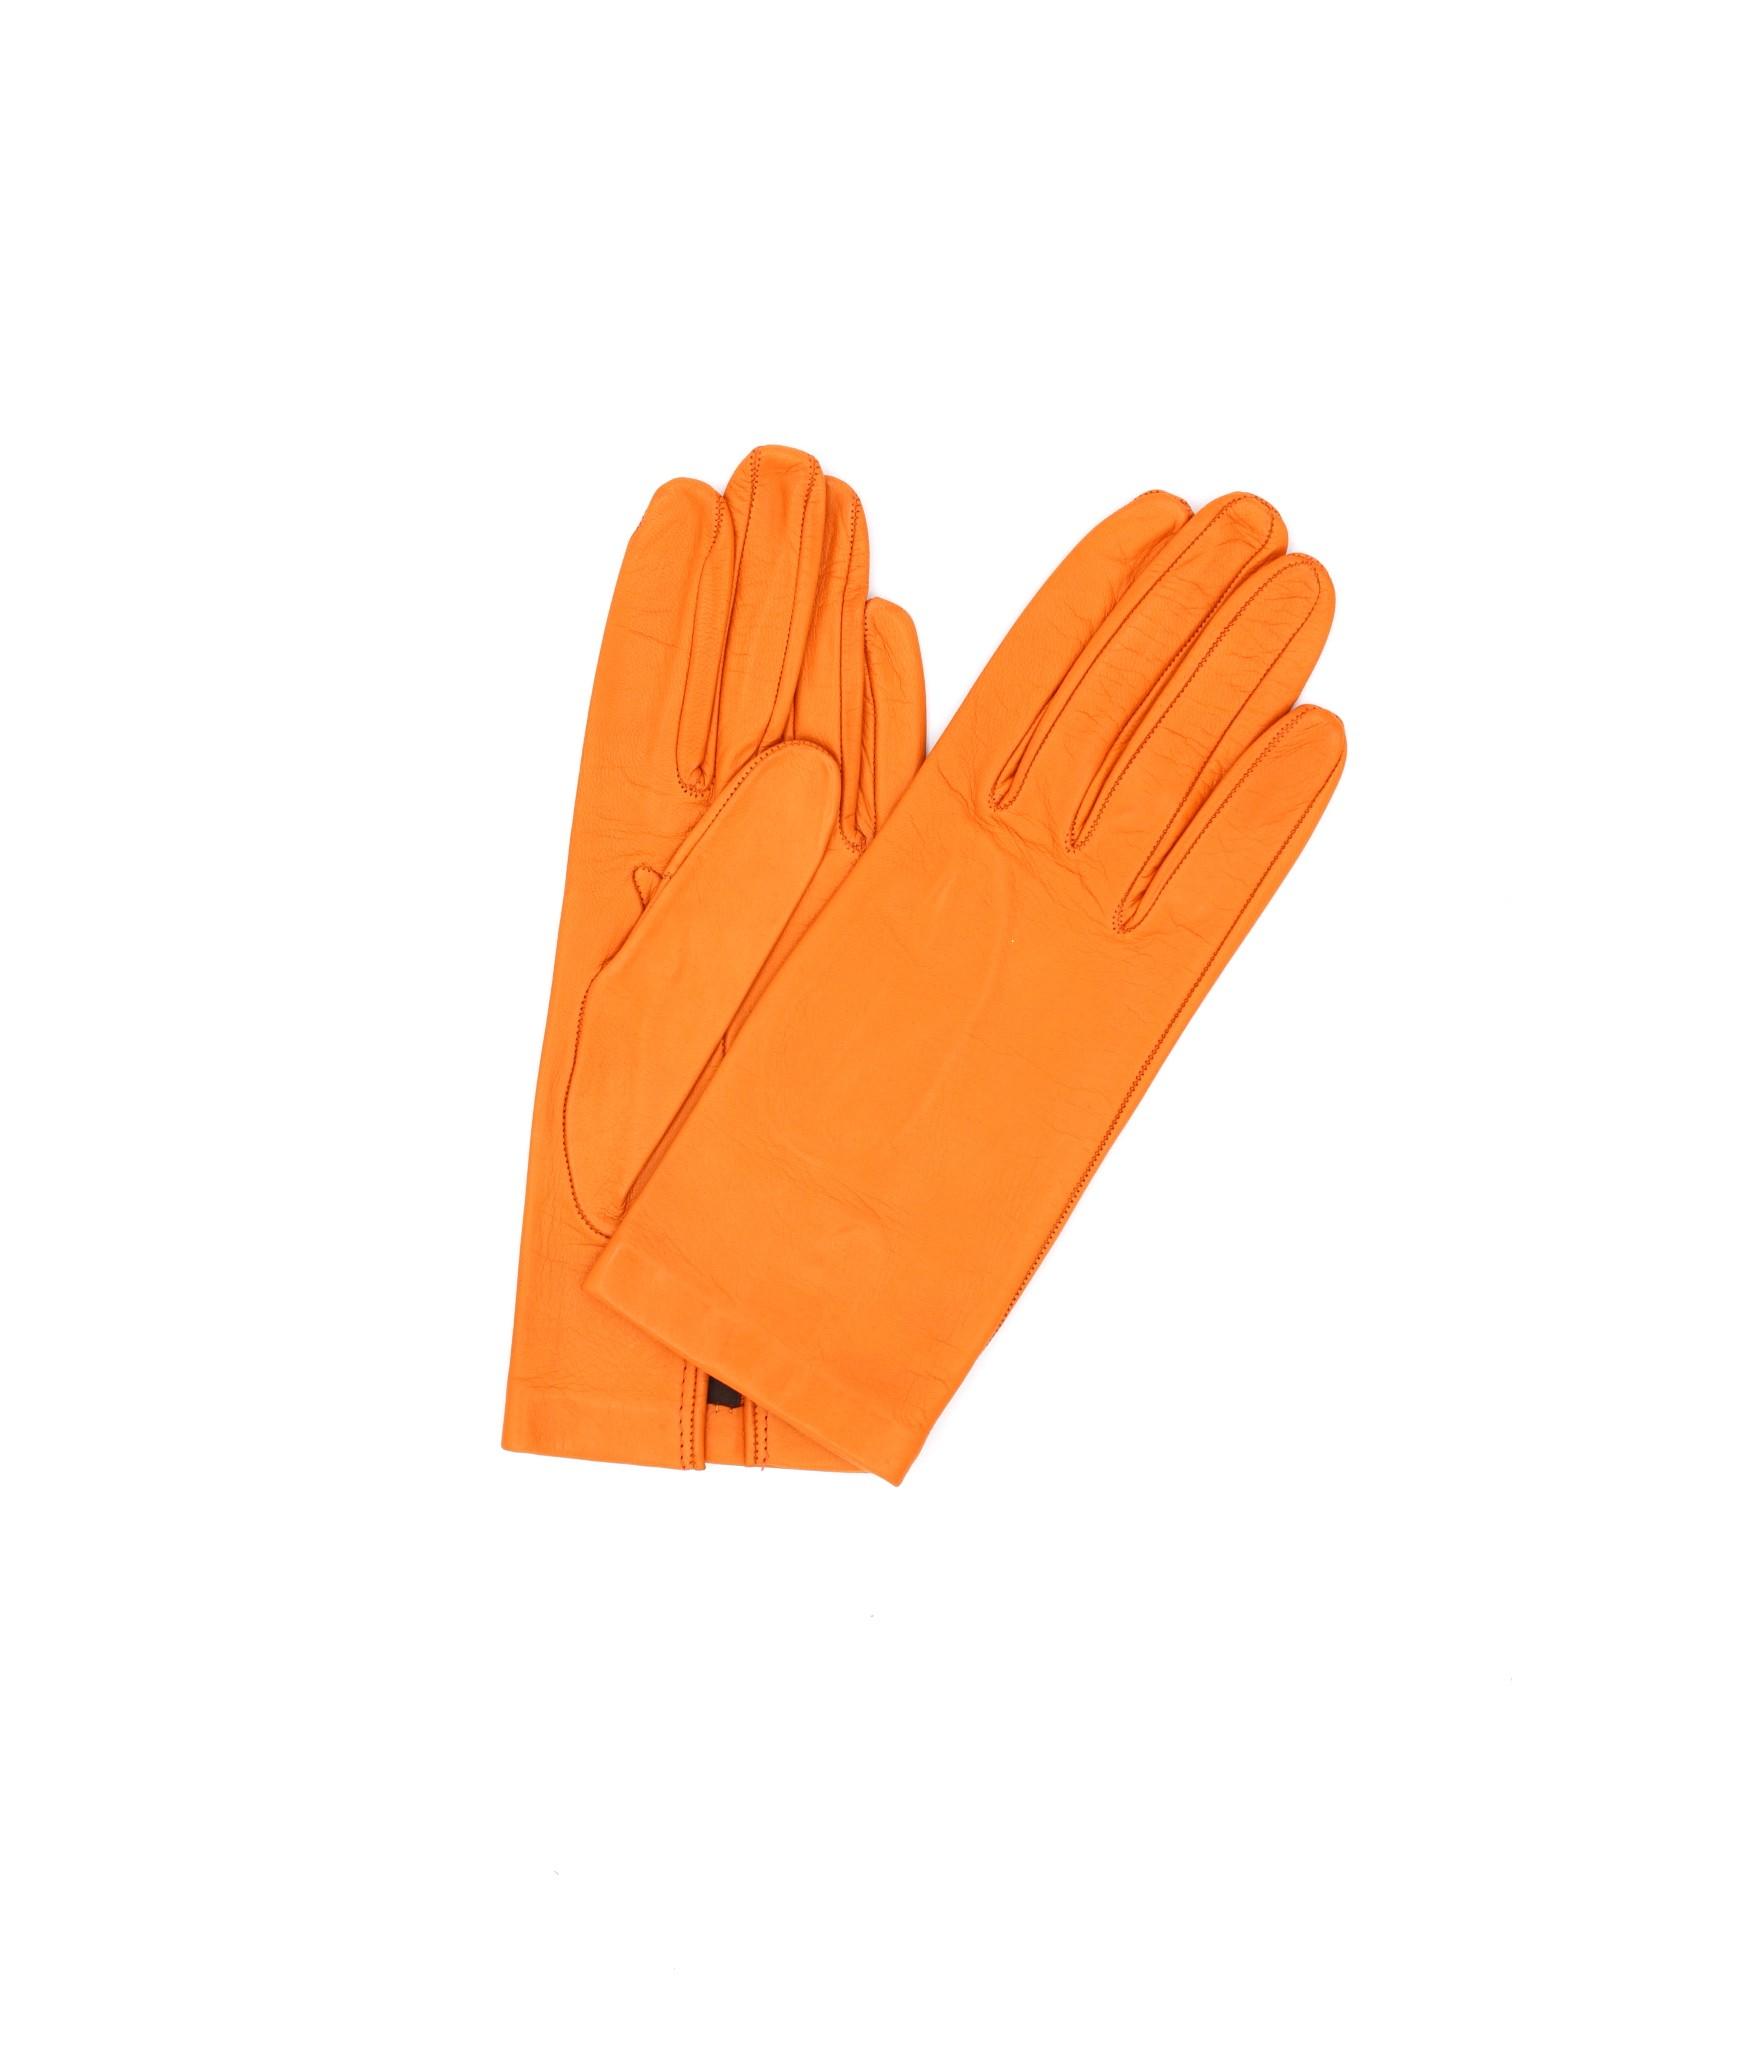 Nappa leather gloves Silk lined Light Orange Sermoneta Gloves